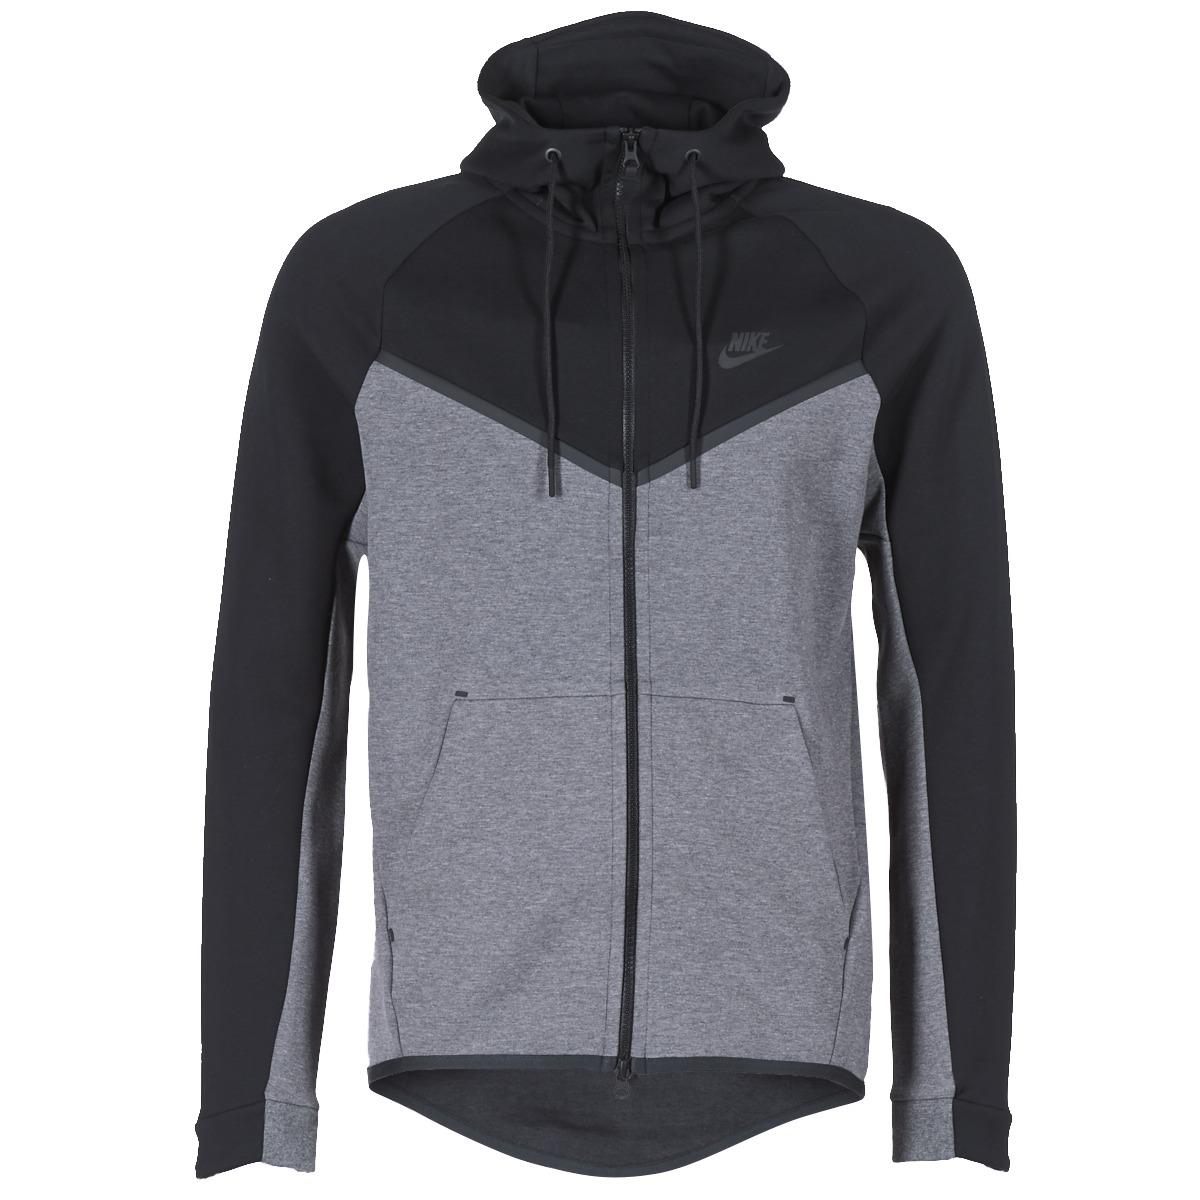 7d23ec5da2 Nike Tech Fleece Windrunner Hoodie Men s Jacket In Grey in Gray for ...